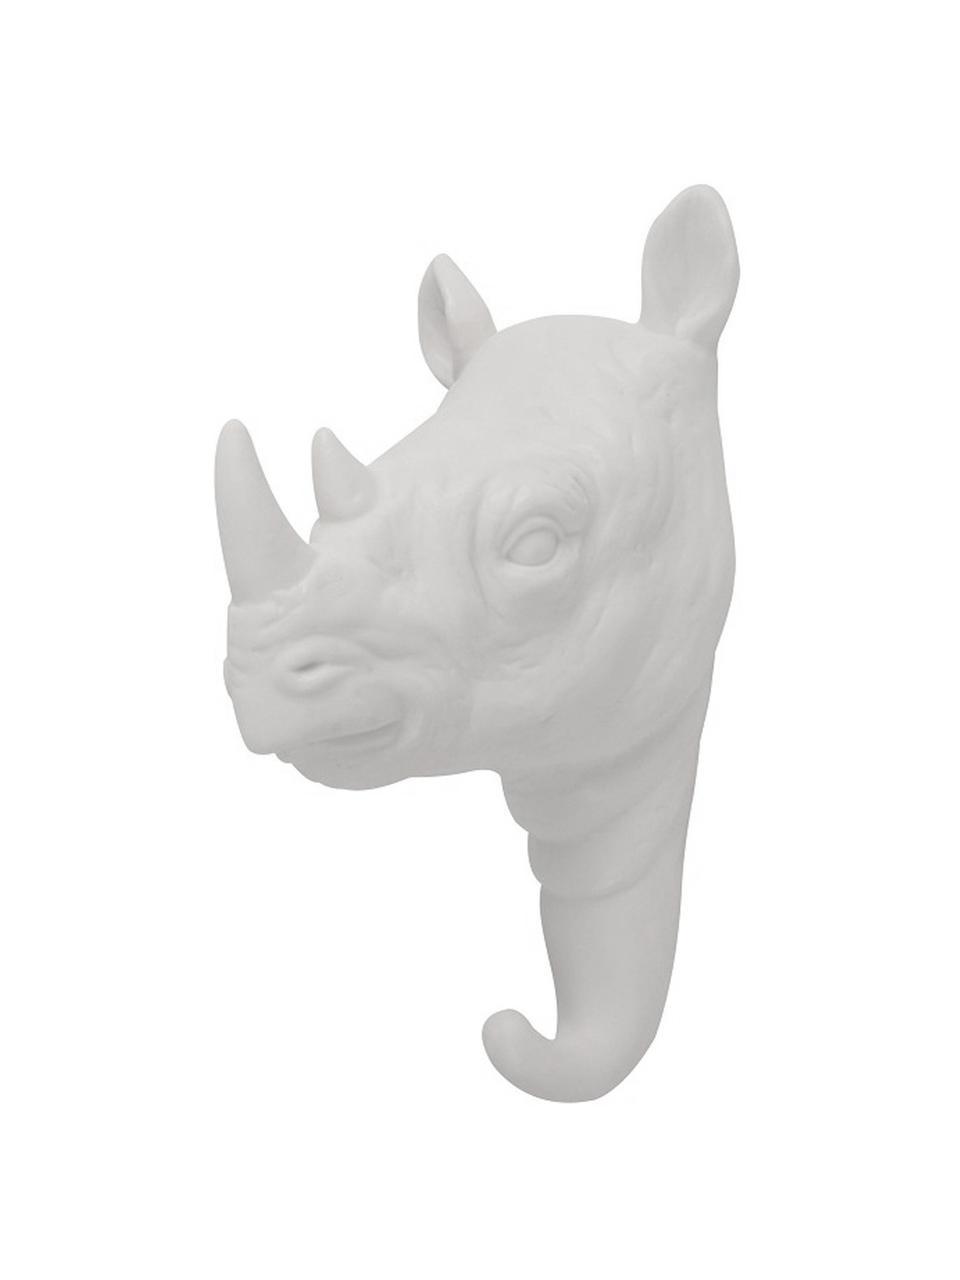 Gancio appendiabiti da parete in porcellana Rhino, Porcellana, Bianco, Alt. 14 cm